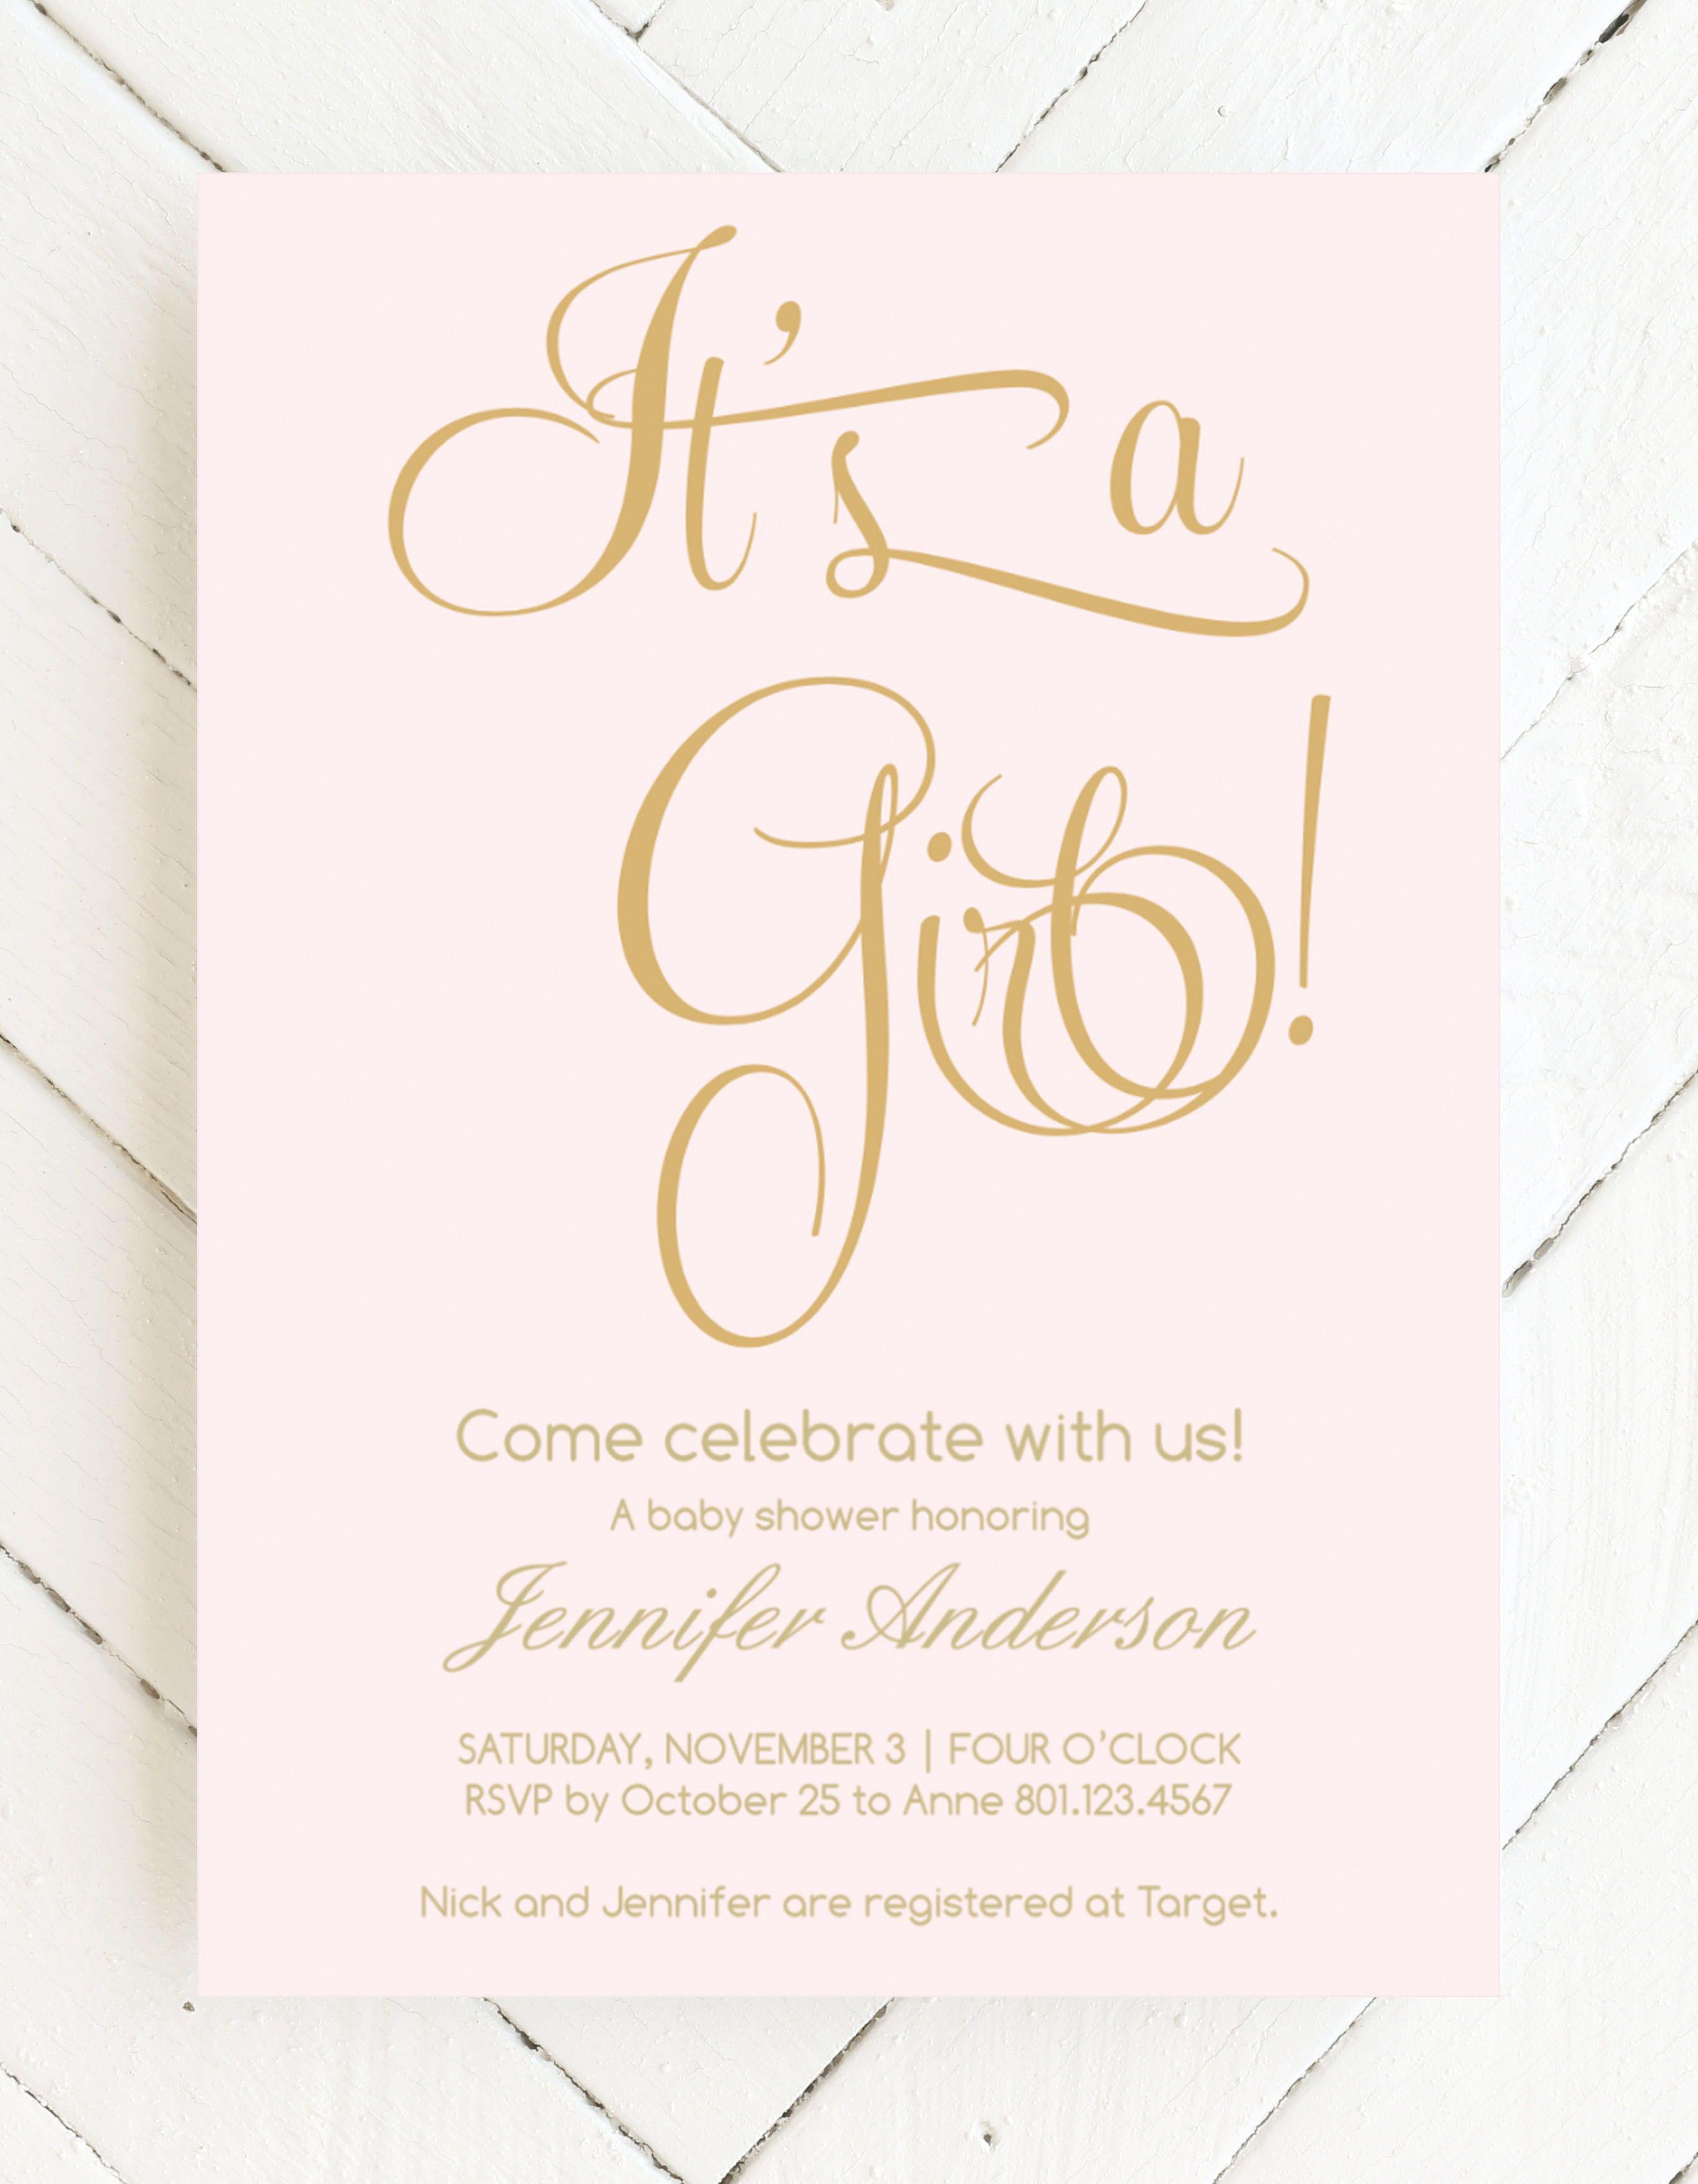 Blush Gold Baby Shower Invitations Gold Baby Shower Invitations Vintage Baby Shower Invitation Pink Baby Shower Invitations